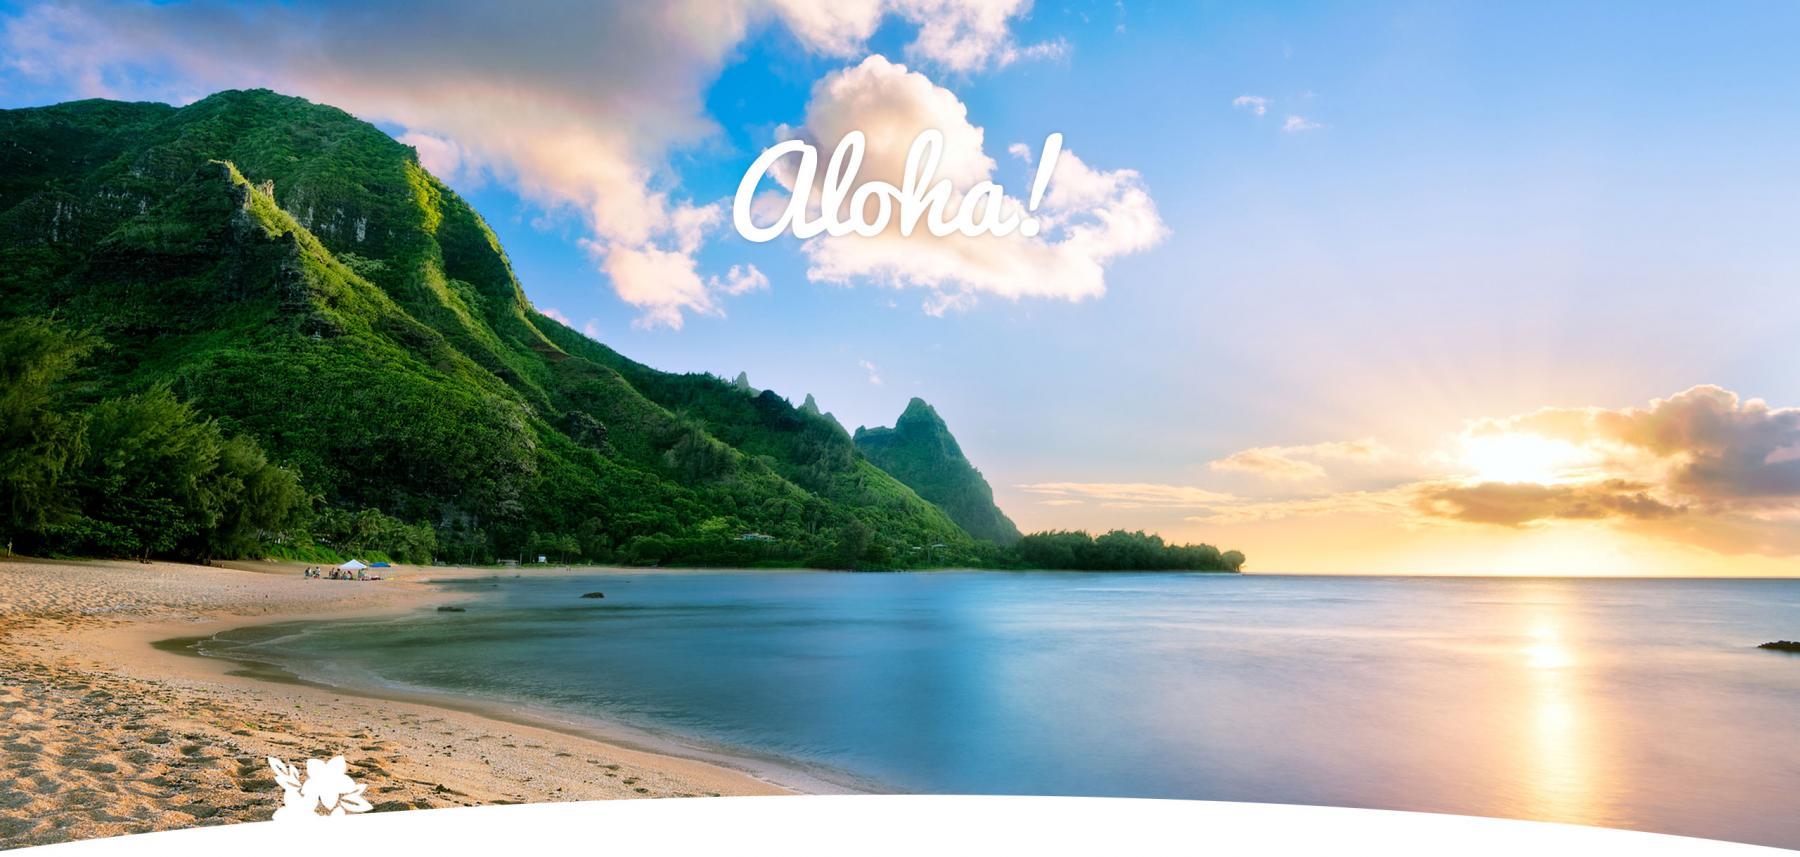 Garden Island Properties U0026 Kauai Vacation Rentals | Garden Island  Properties Kaha Lani